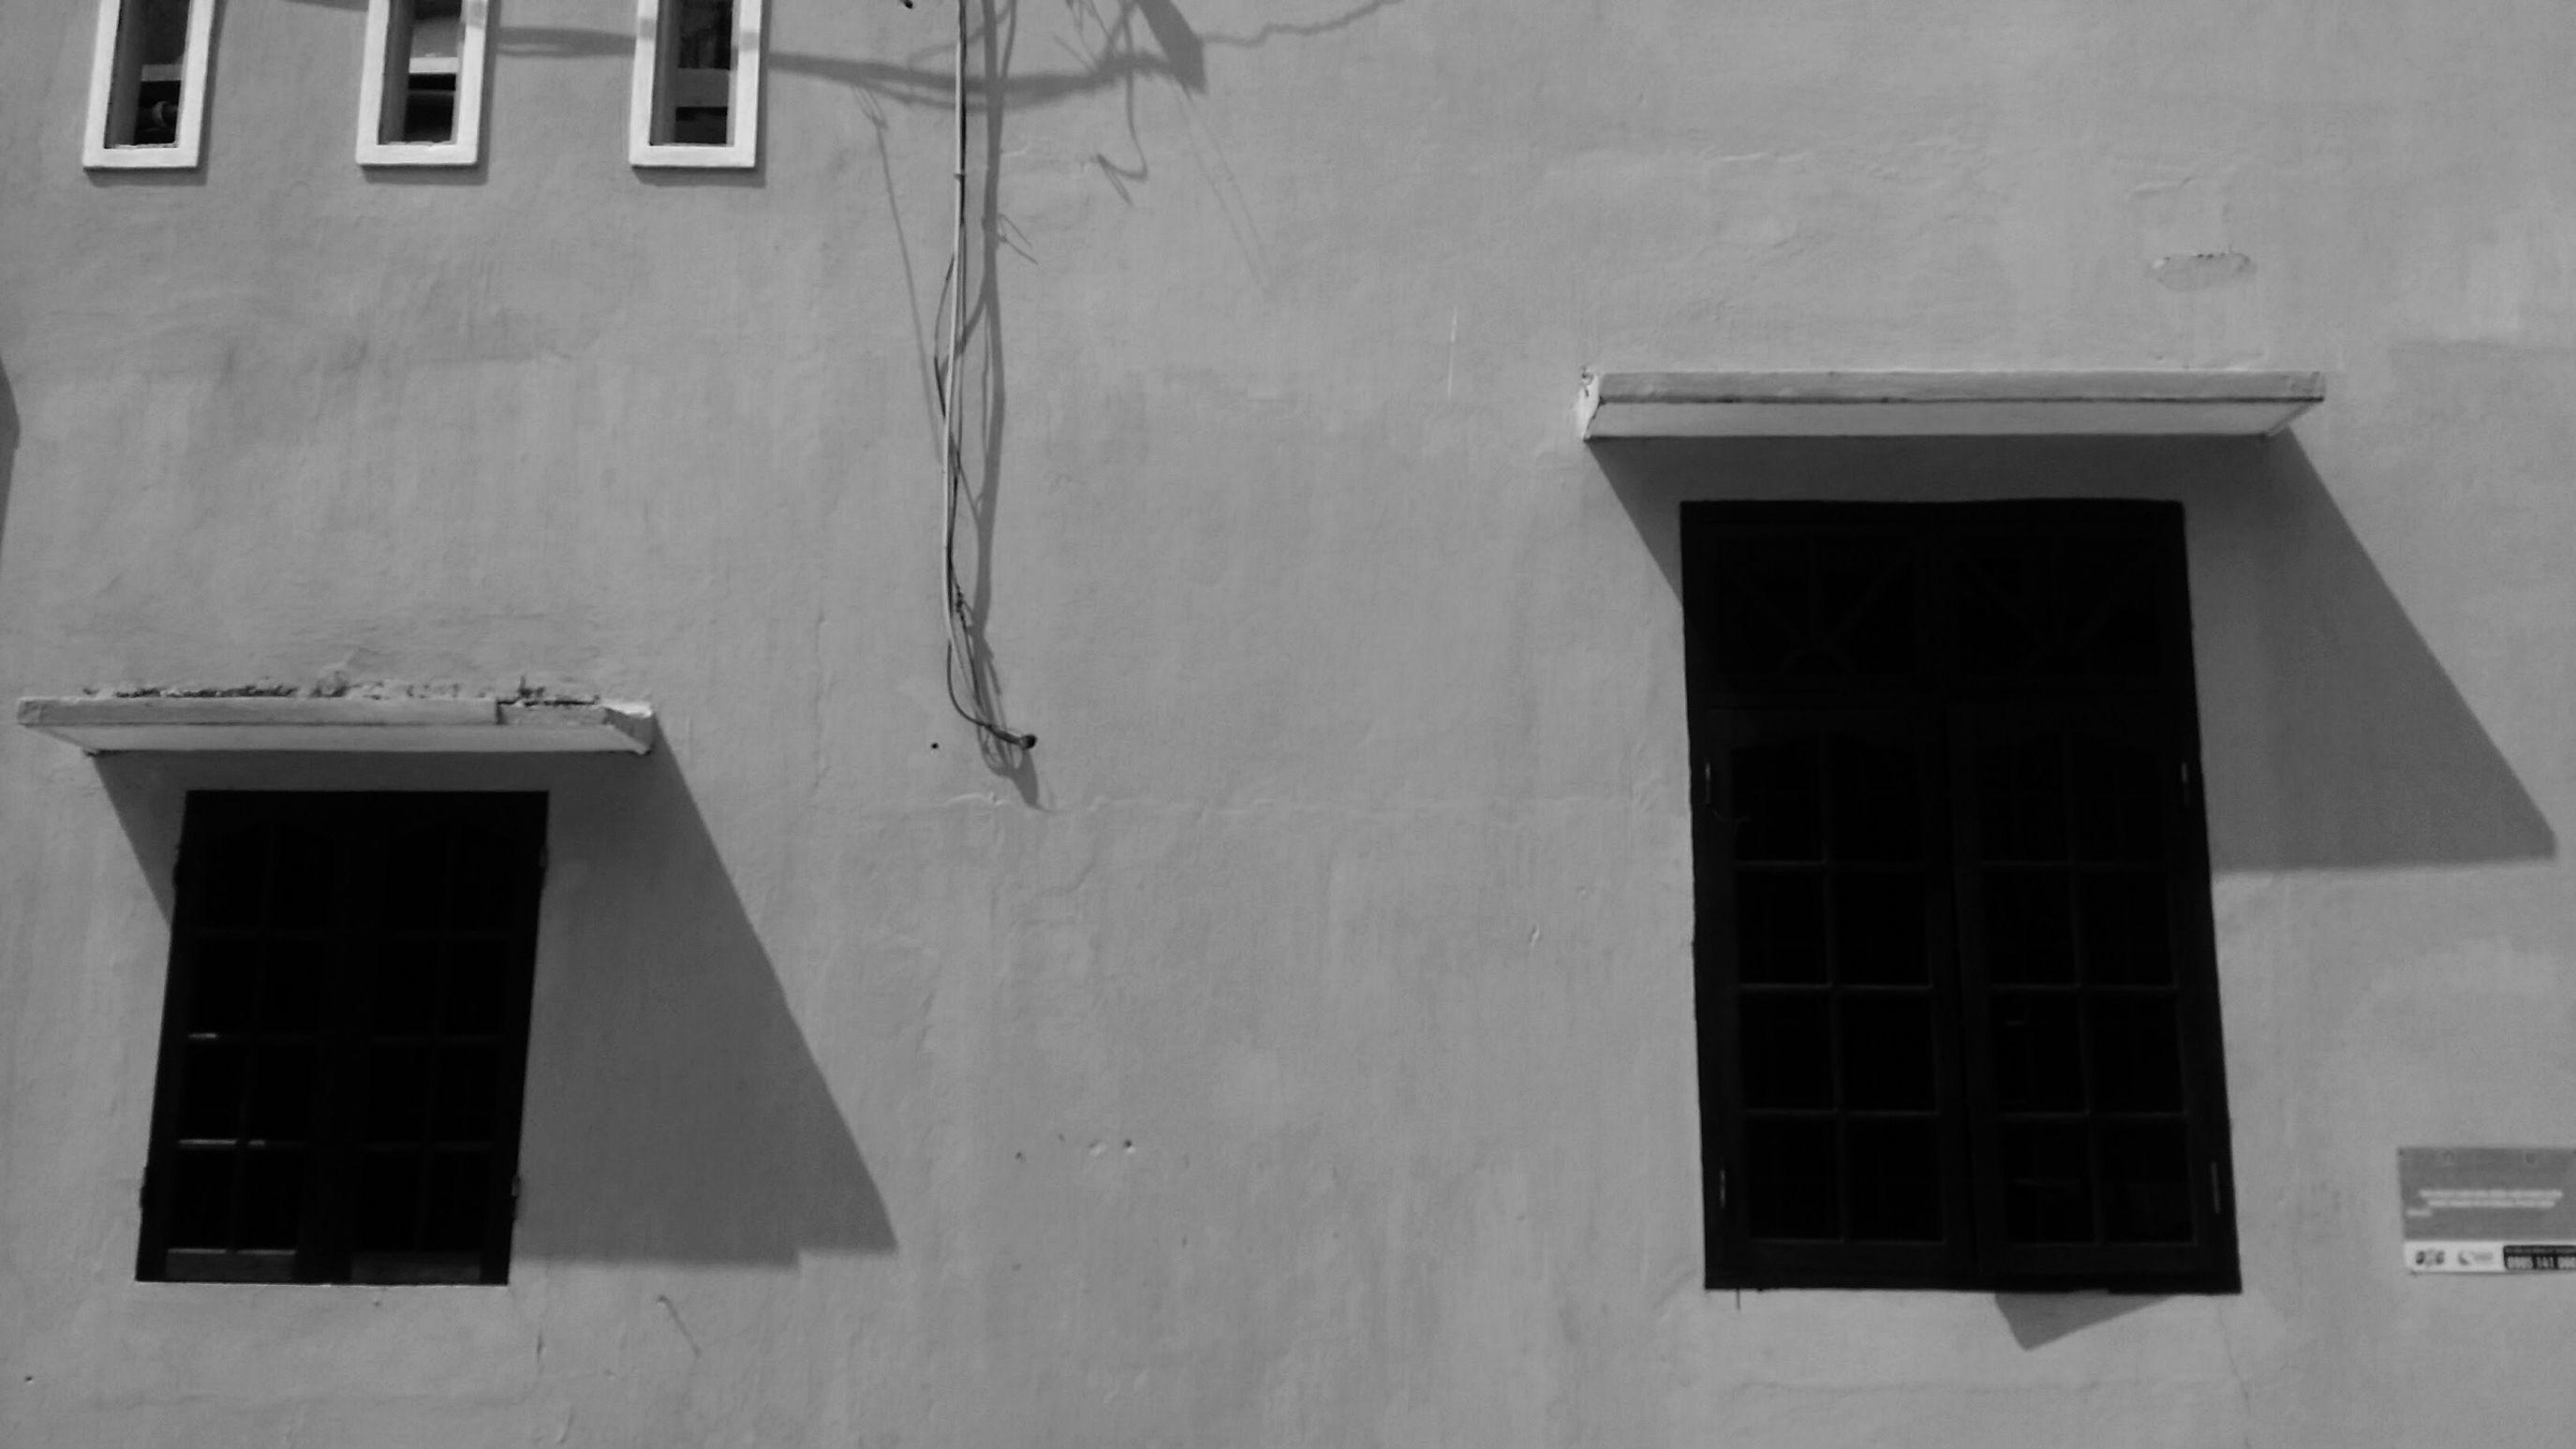 B&w Street Photography Vietnam Hoian  Wall&windows First Eyeem Photo